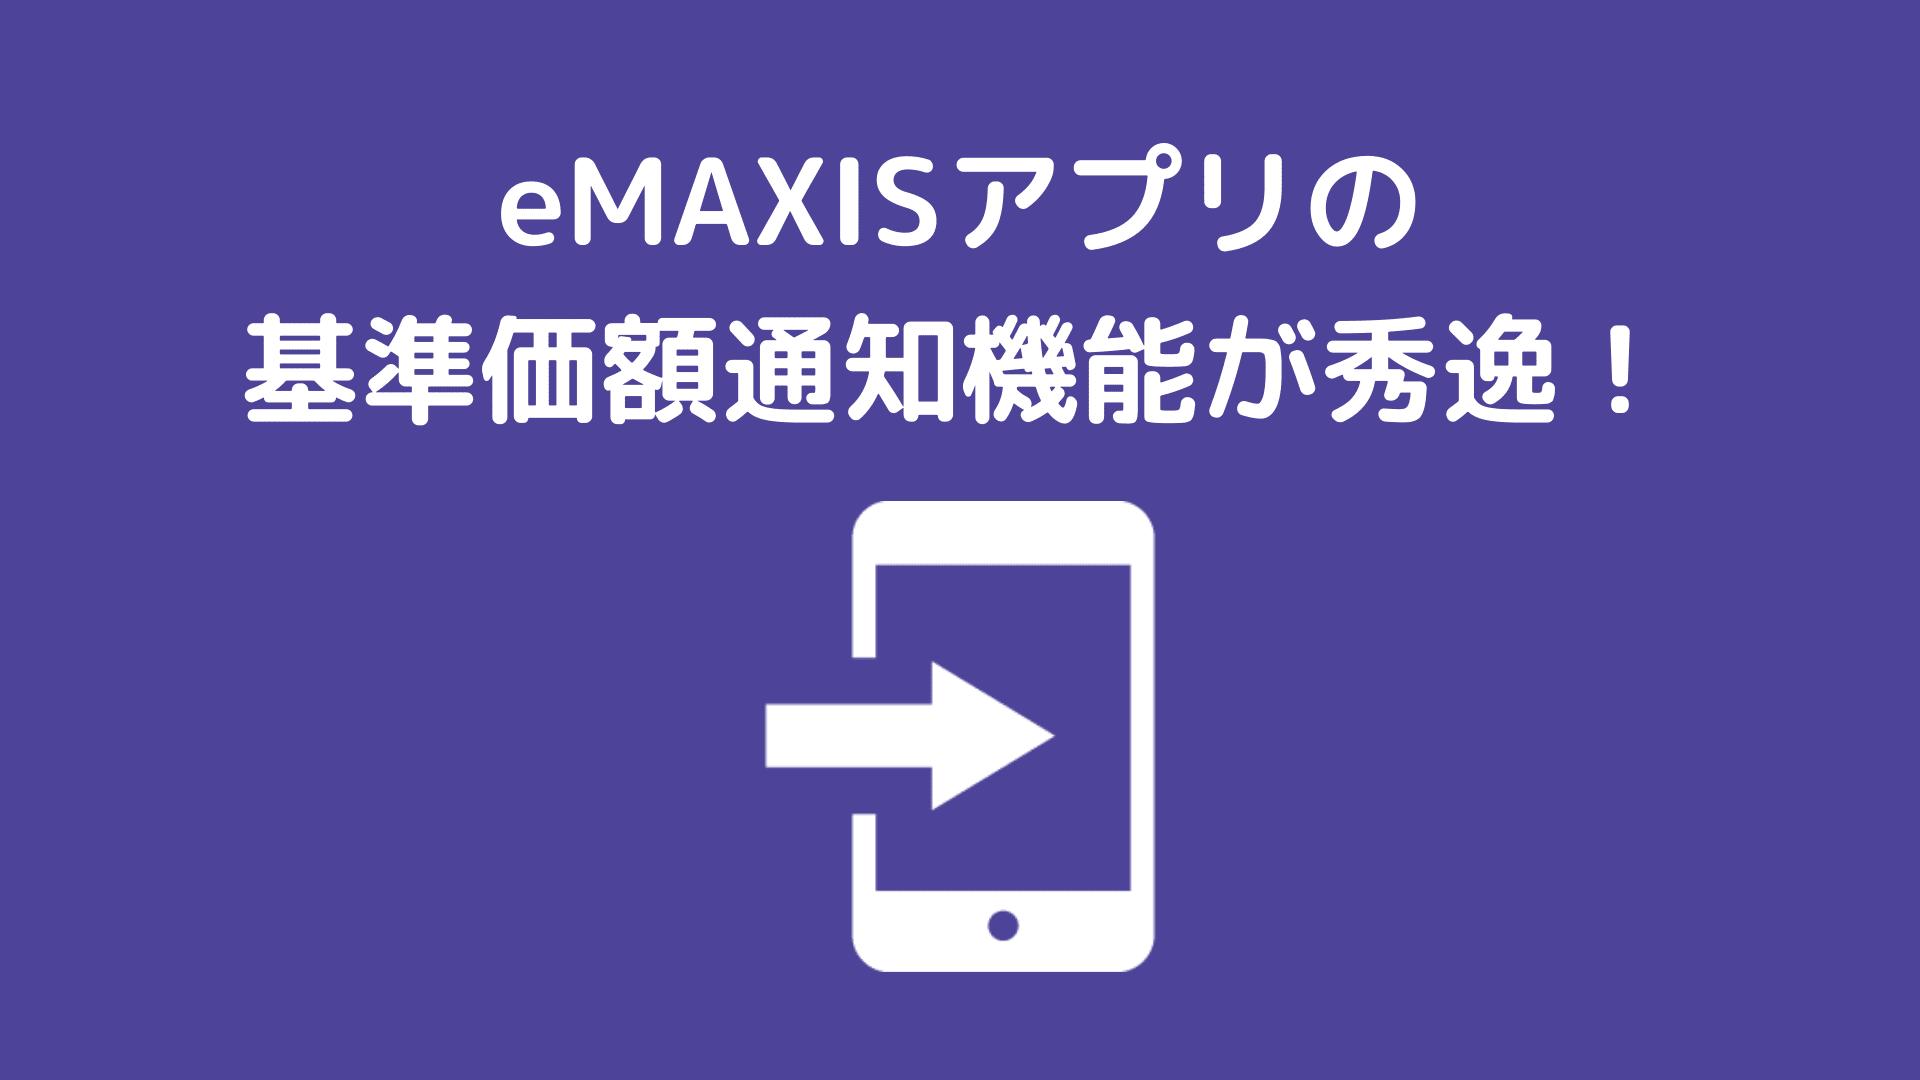 EMAXIS appli